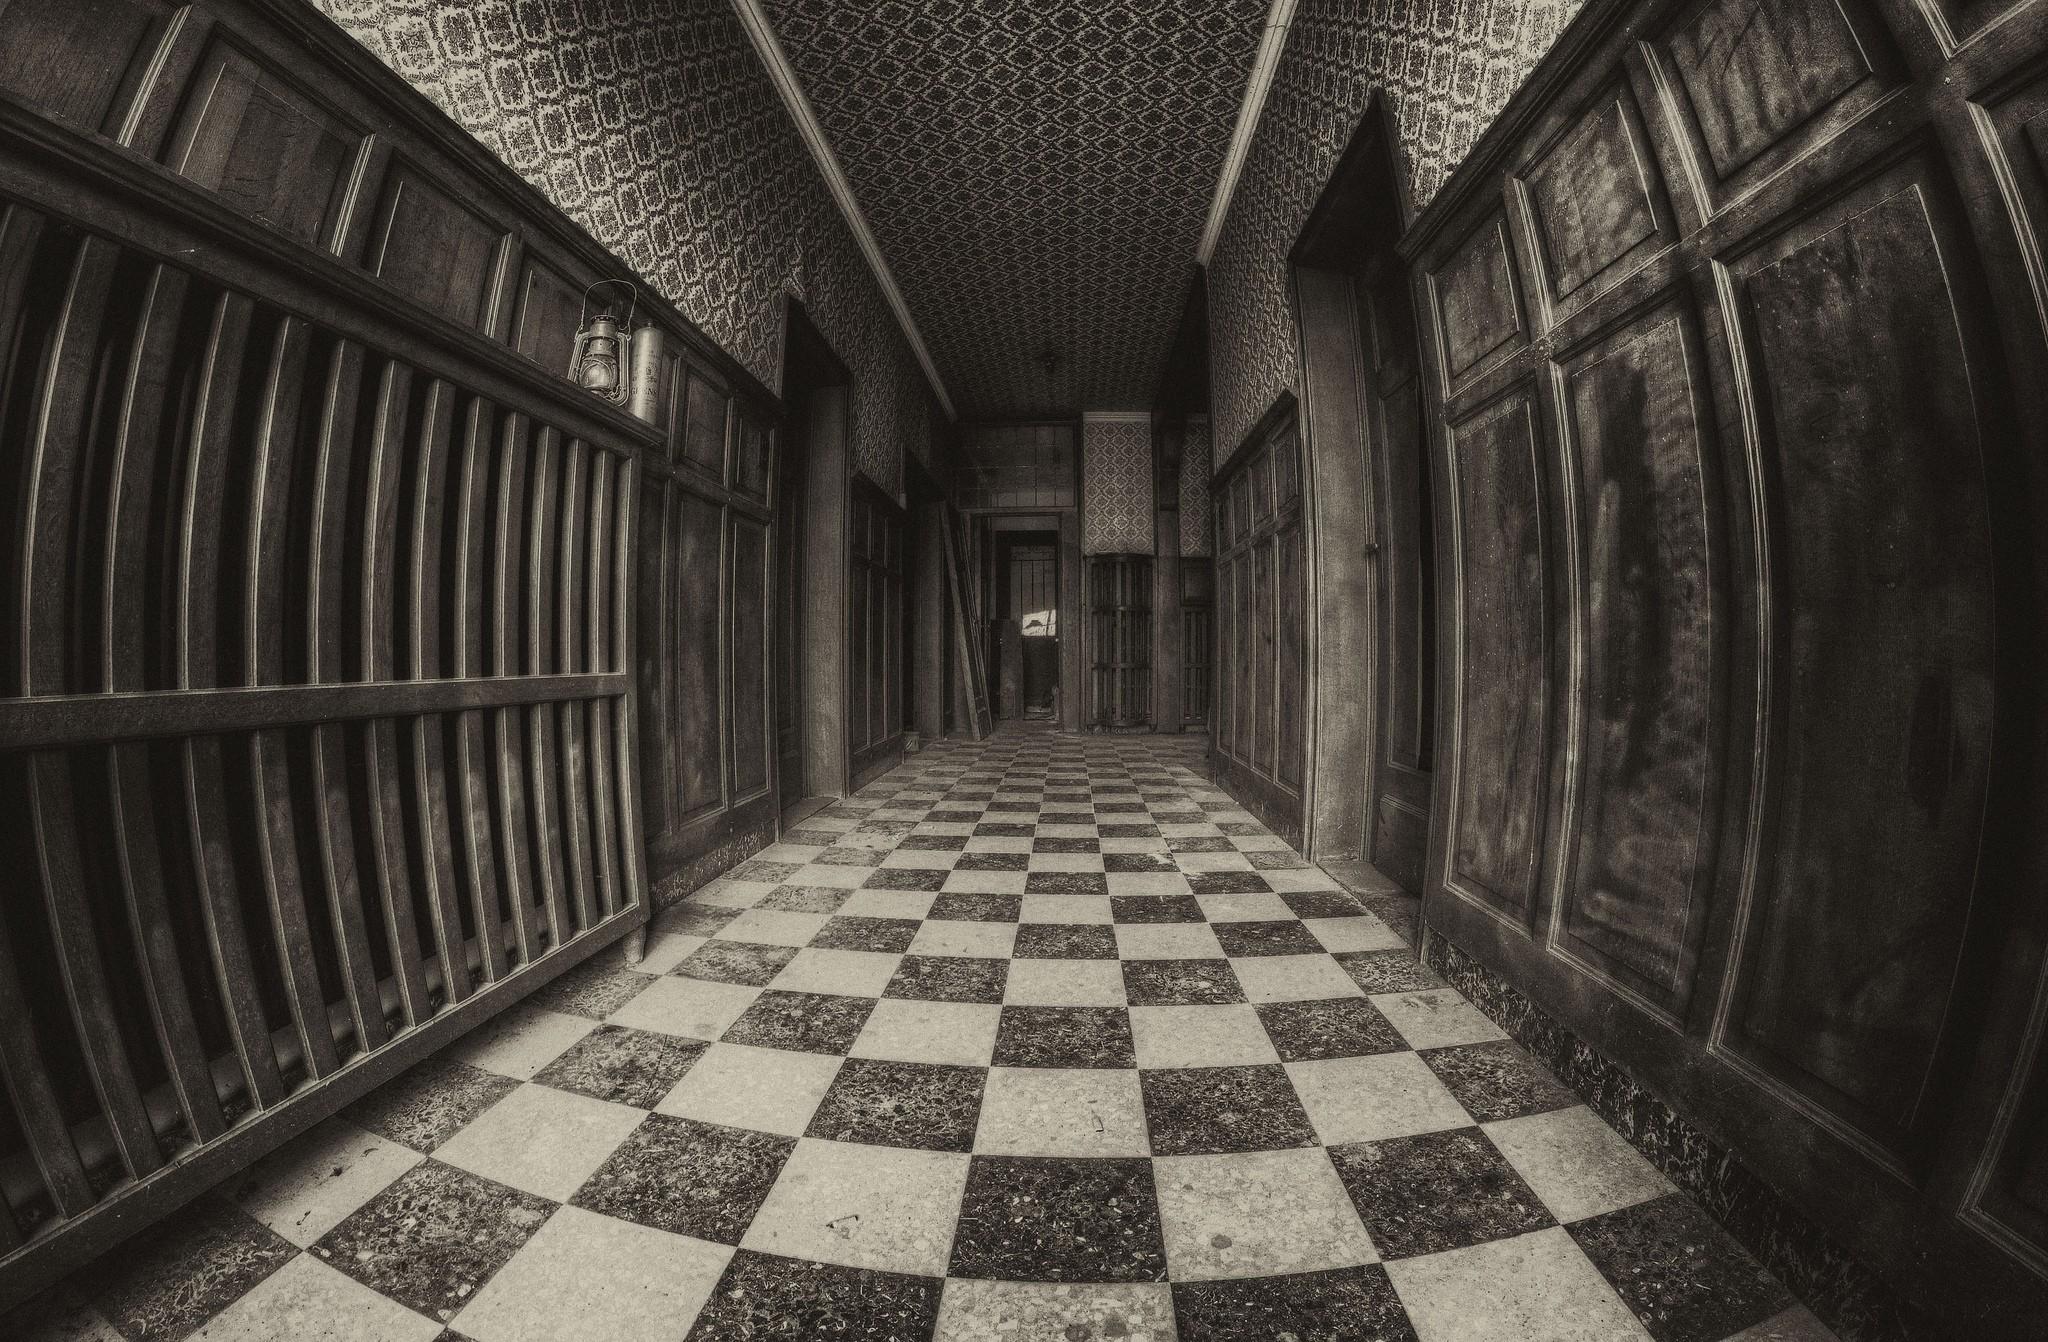 Foyer Hallway Urban Dictionary : Wallpaper digital art street interior hallway